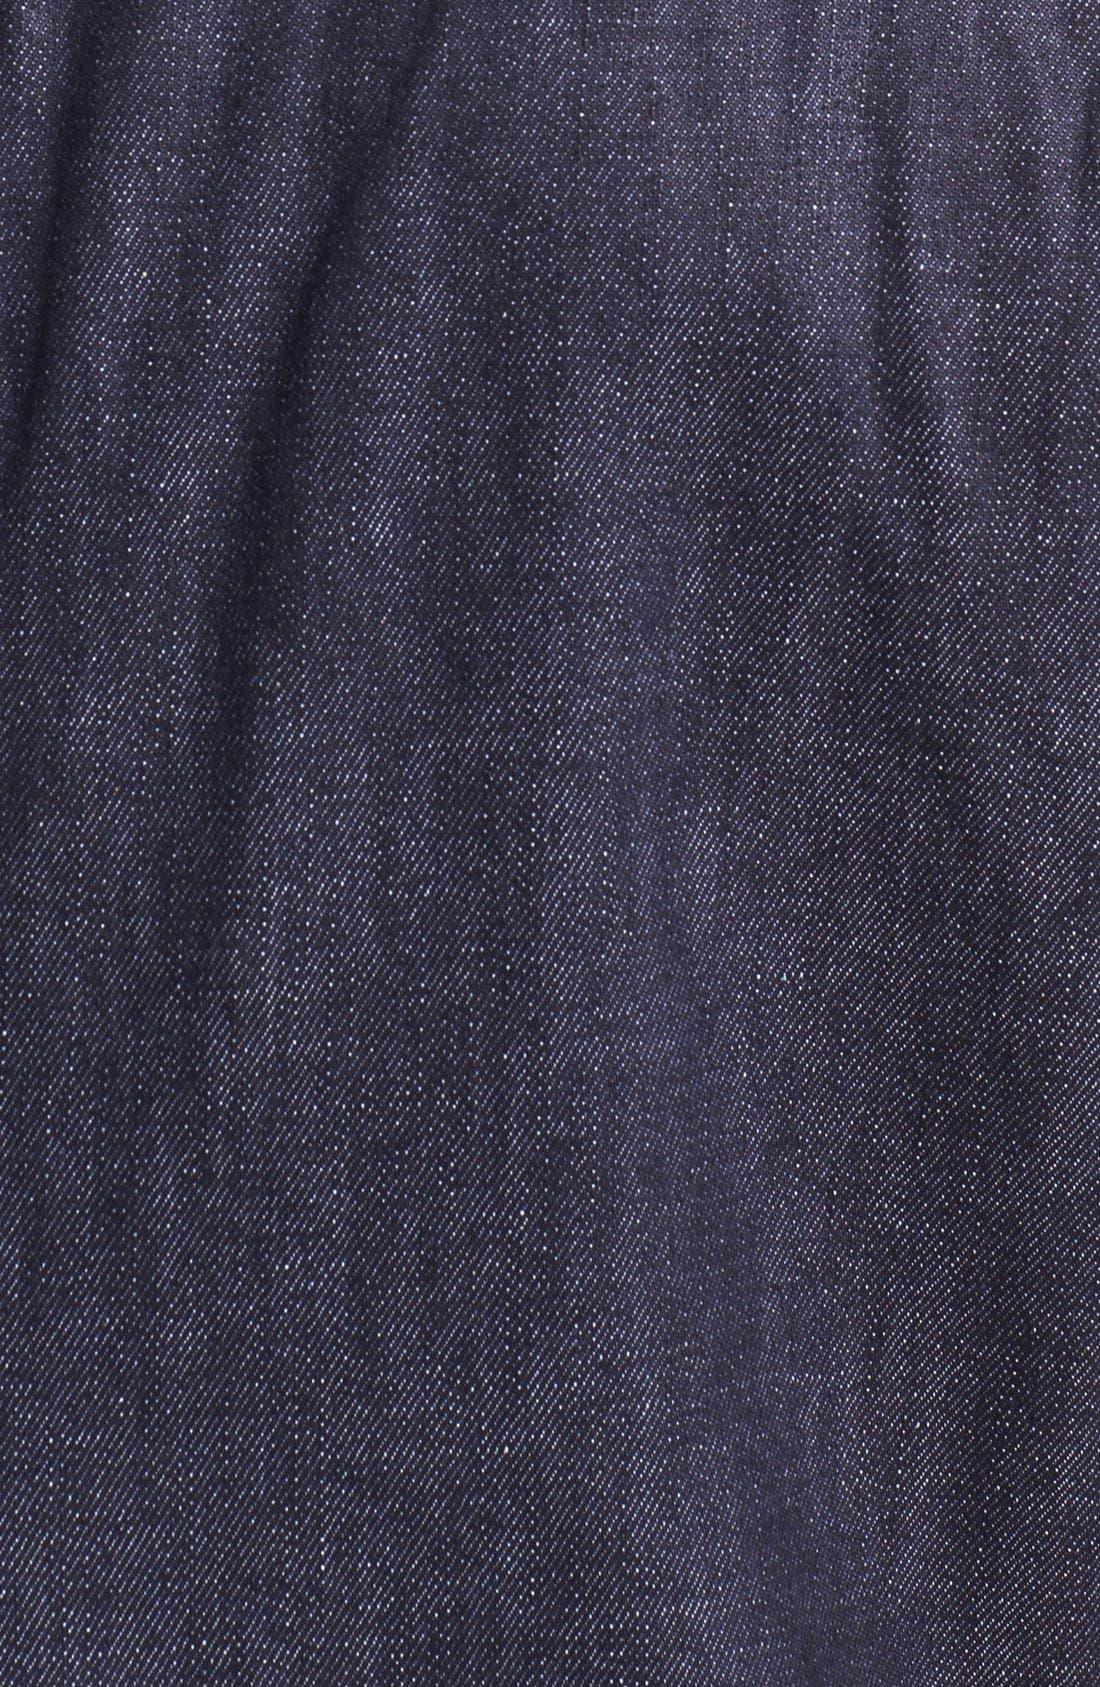 Alternate Image 3  - Denim & Leathers by Andrew Marc Café Racer Denim Jacket